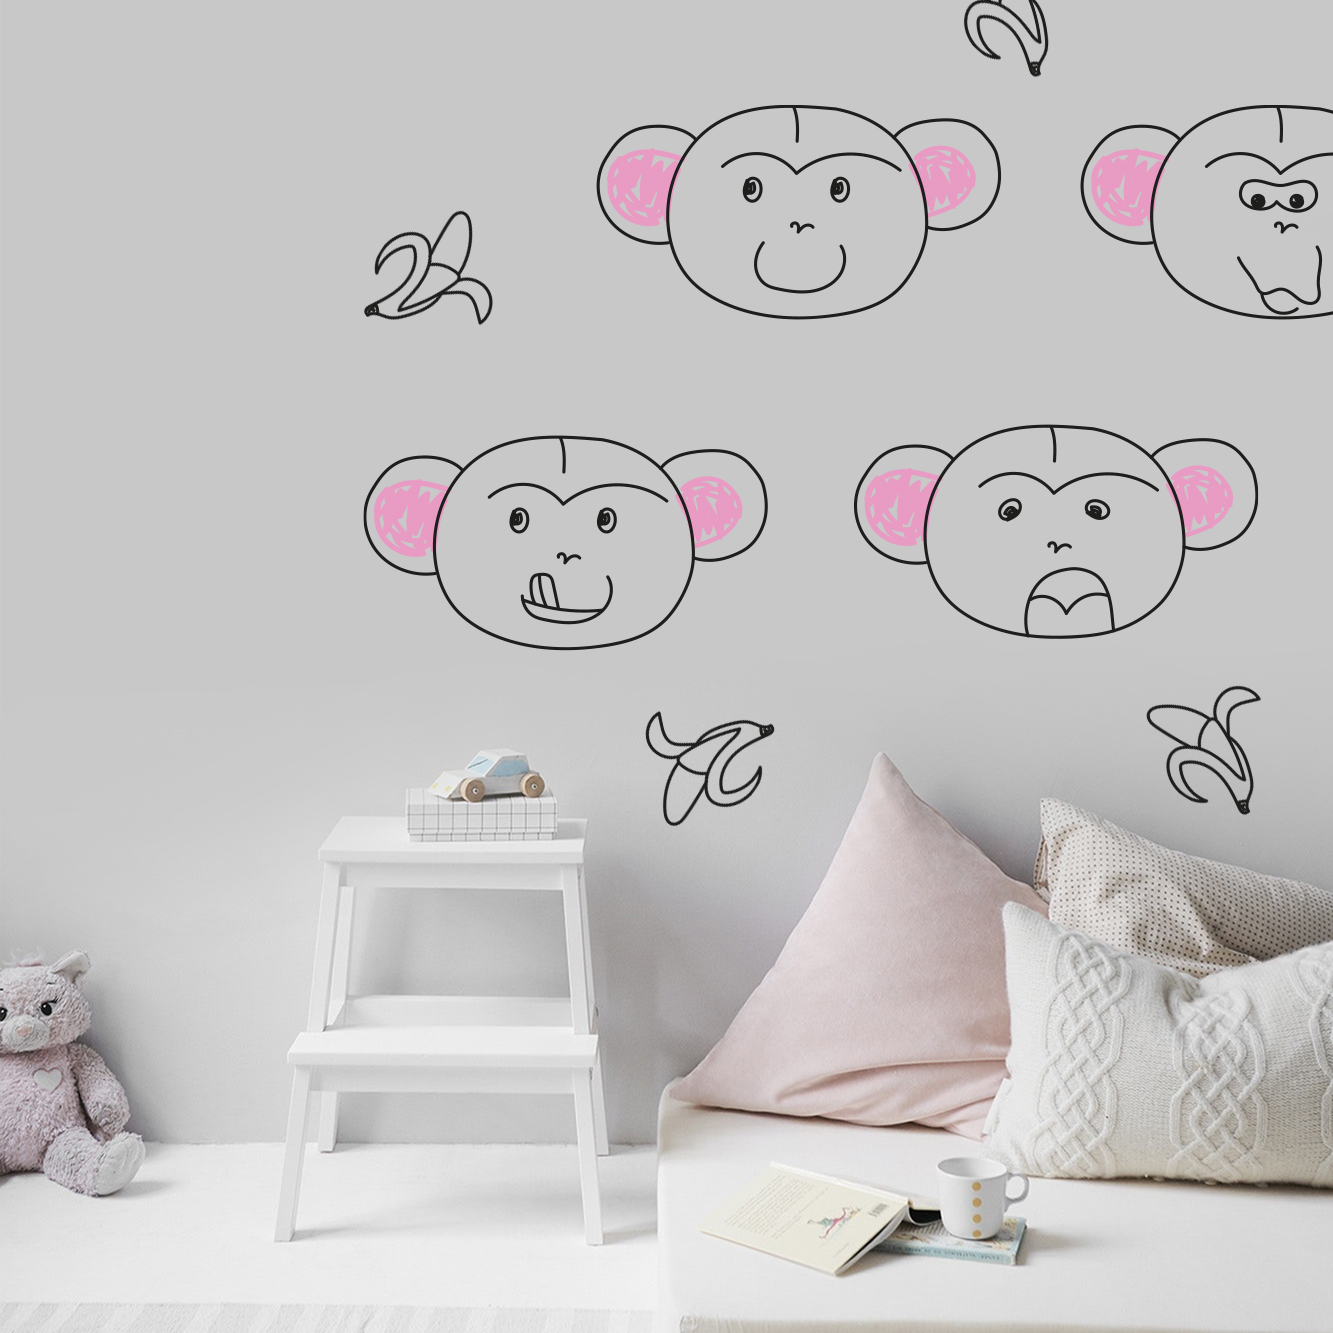 Os 4 macacos